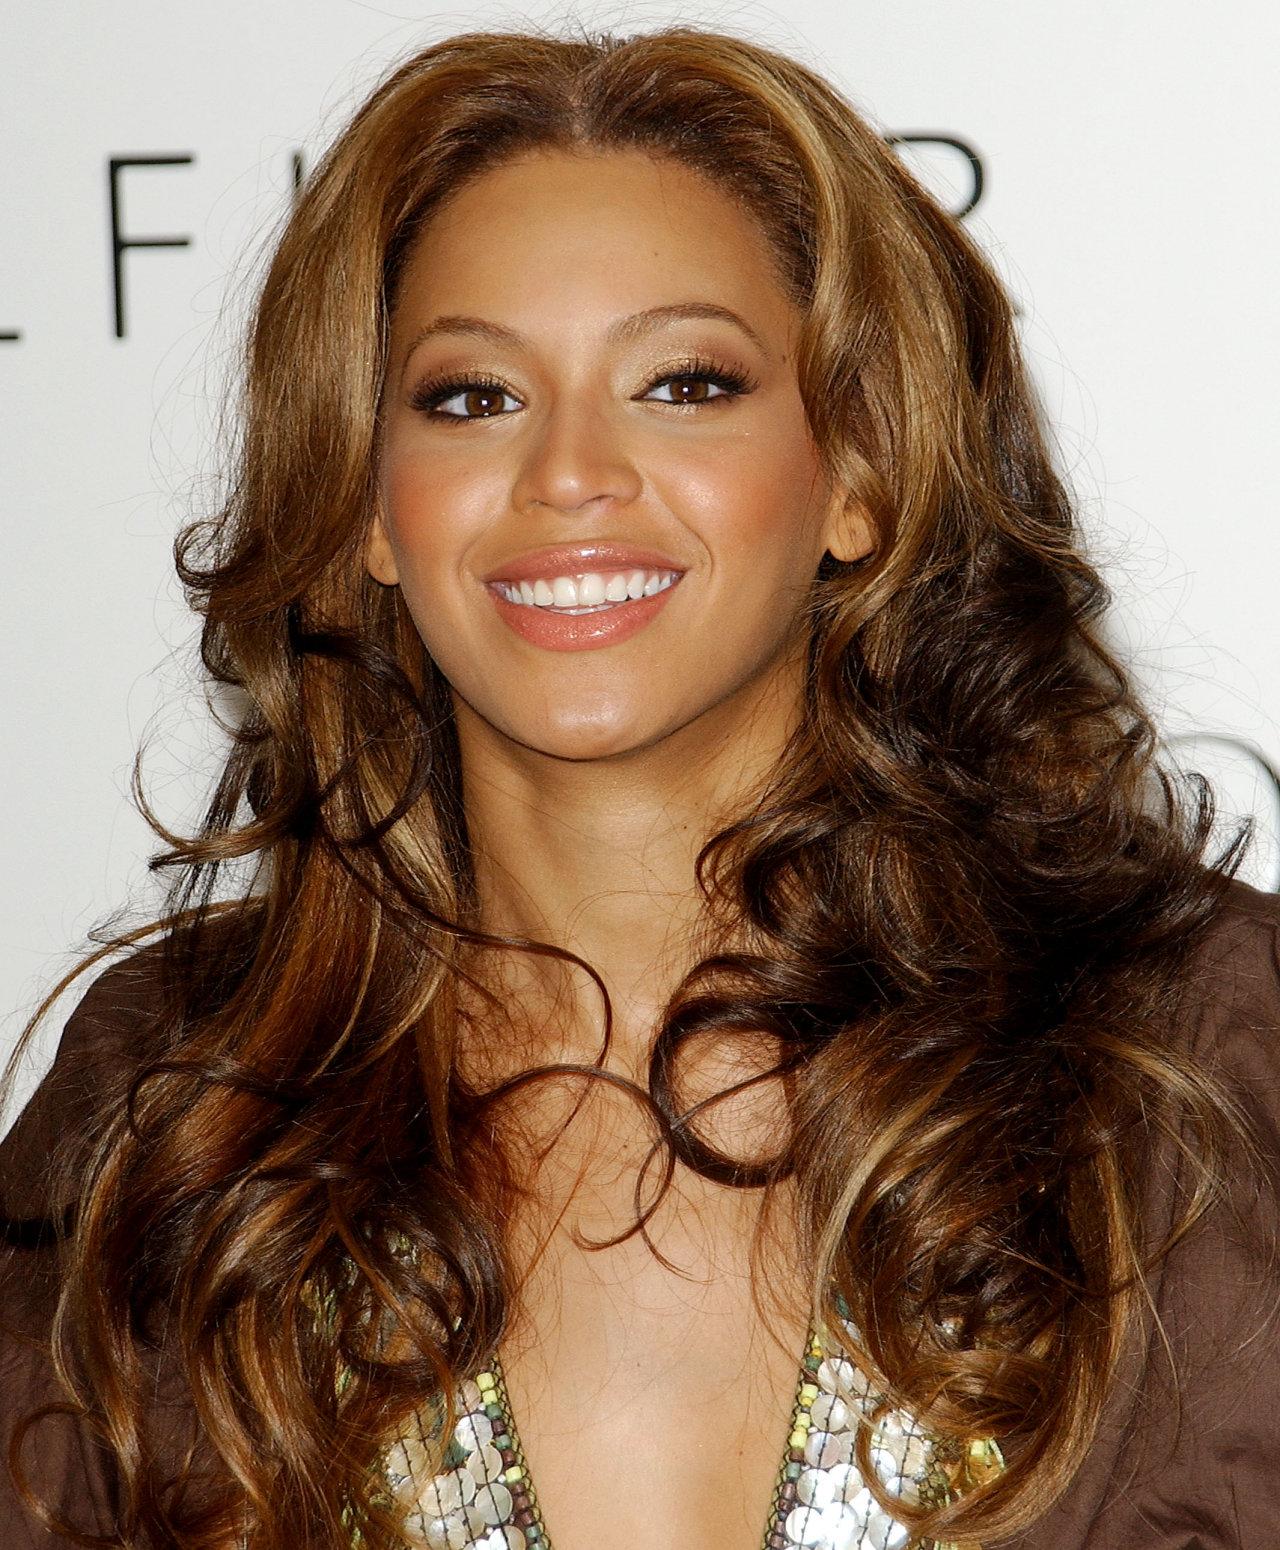 Beyonce Knowles Clipart #1-Beyonce Knowles Clipart #1-7